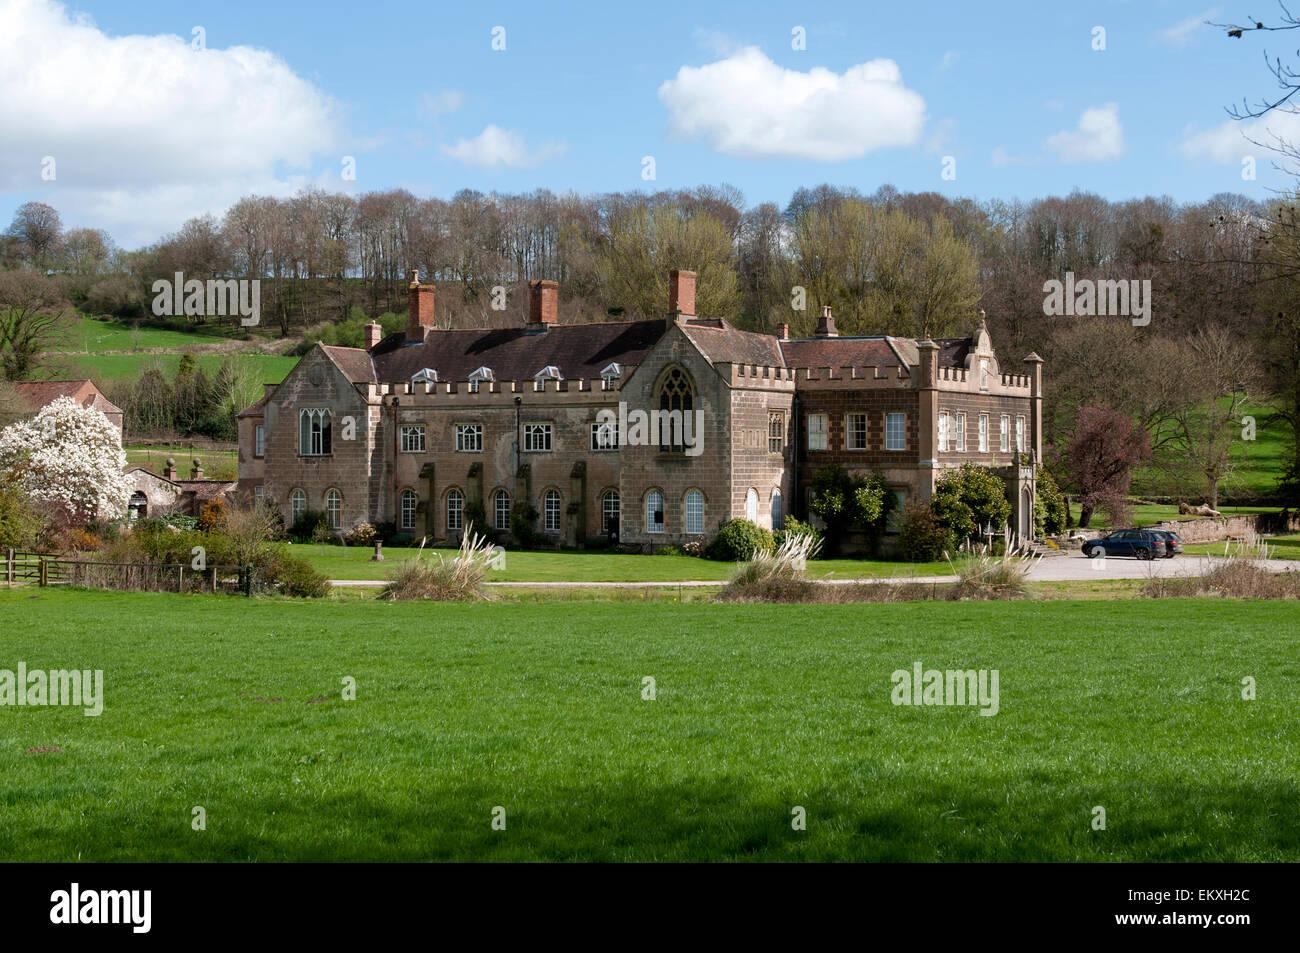 Flaxley Abbey, Gloucestershire, England, UK - Stock Image